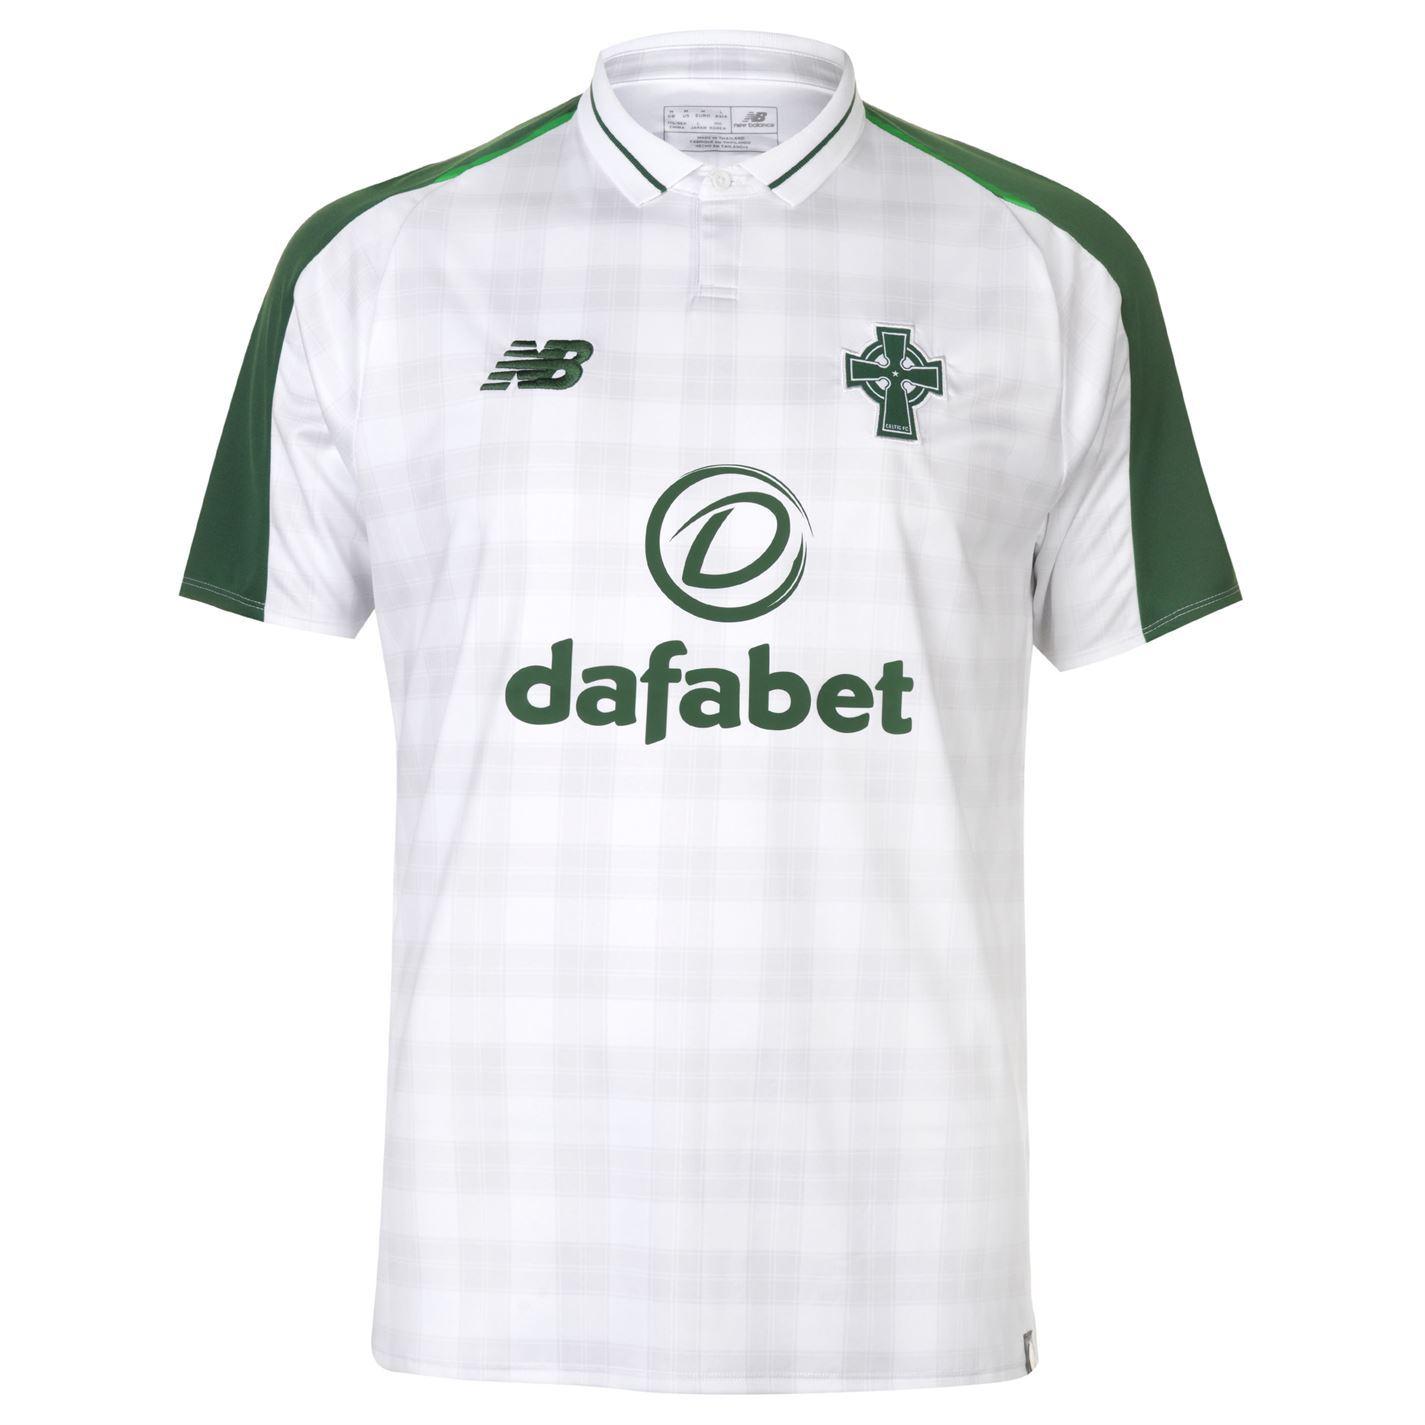 433b772fda9 ... New Balance Celtic Away Jersey 2018 2019 Juniors White Football Soccer  Shirt Top ...